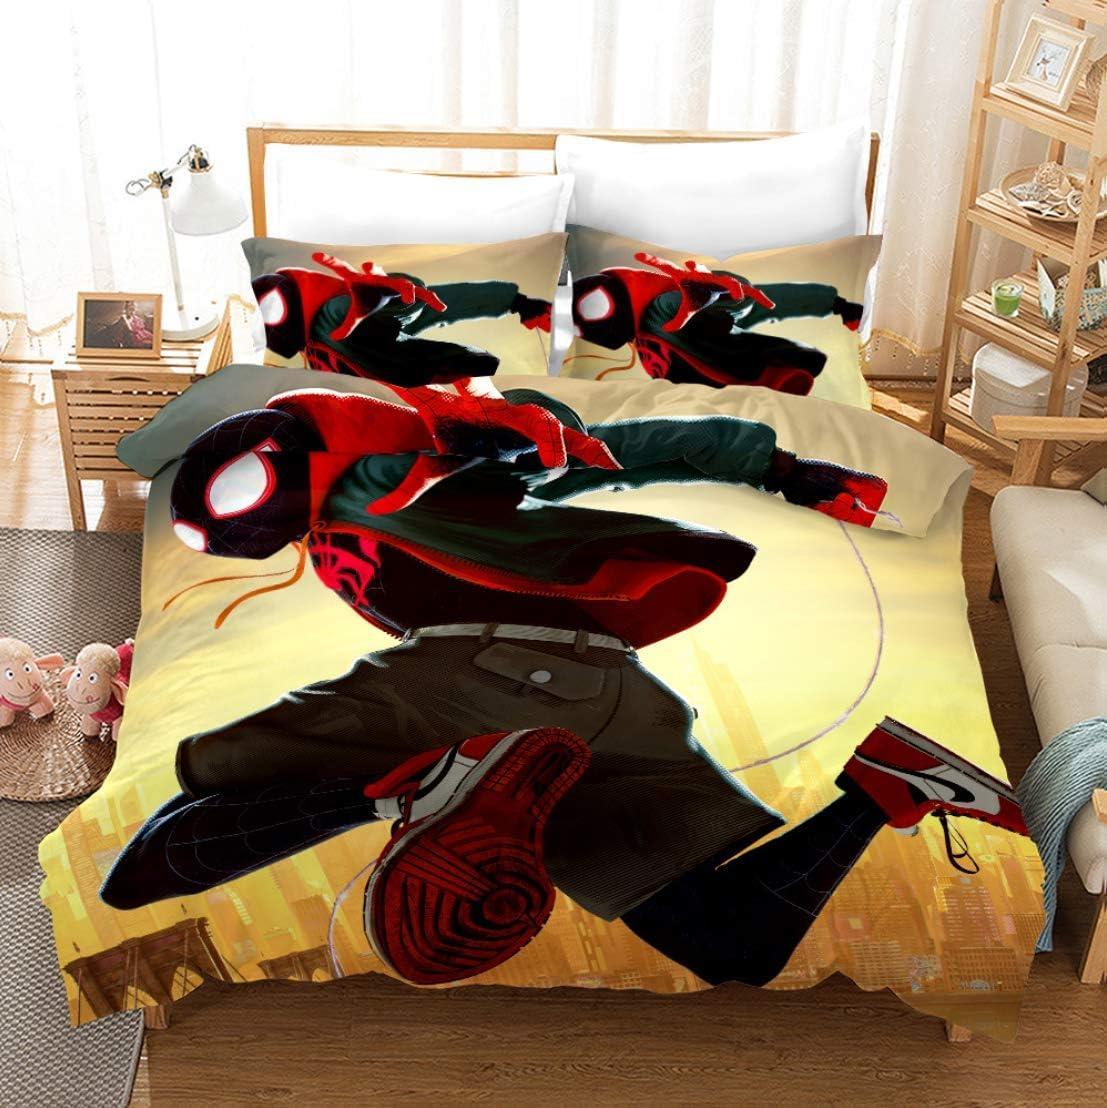 NOOS Marvel Spider-Man Bedding for Boys 3D Spider-Man Duvet Cover Queen Size, Cartoon Marvel Comforter Cover Set, Suitable Kids and Teen Super Soft Microfiber Bed Set 3PC,1Duvet Cover, 2Pillowcases